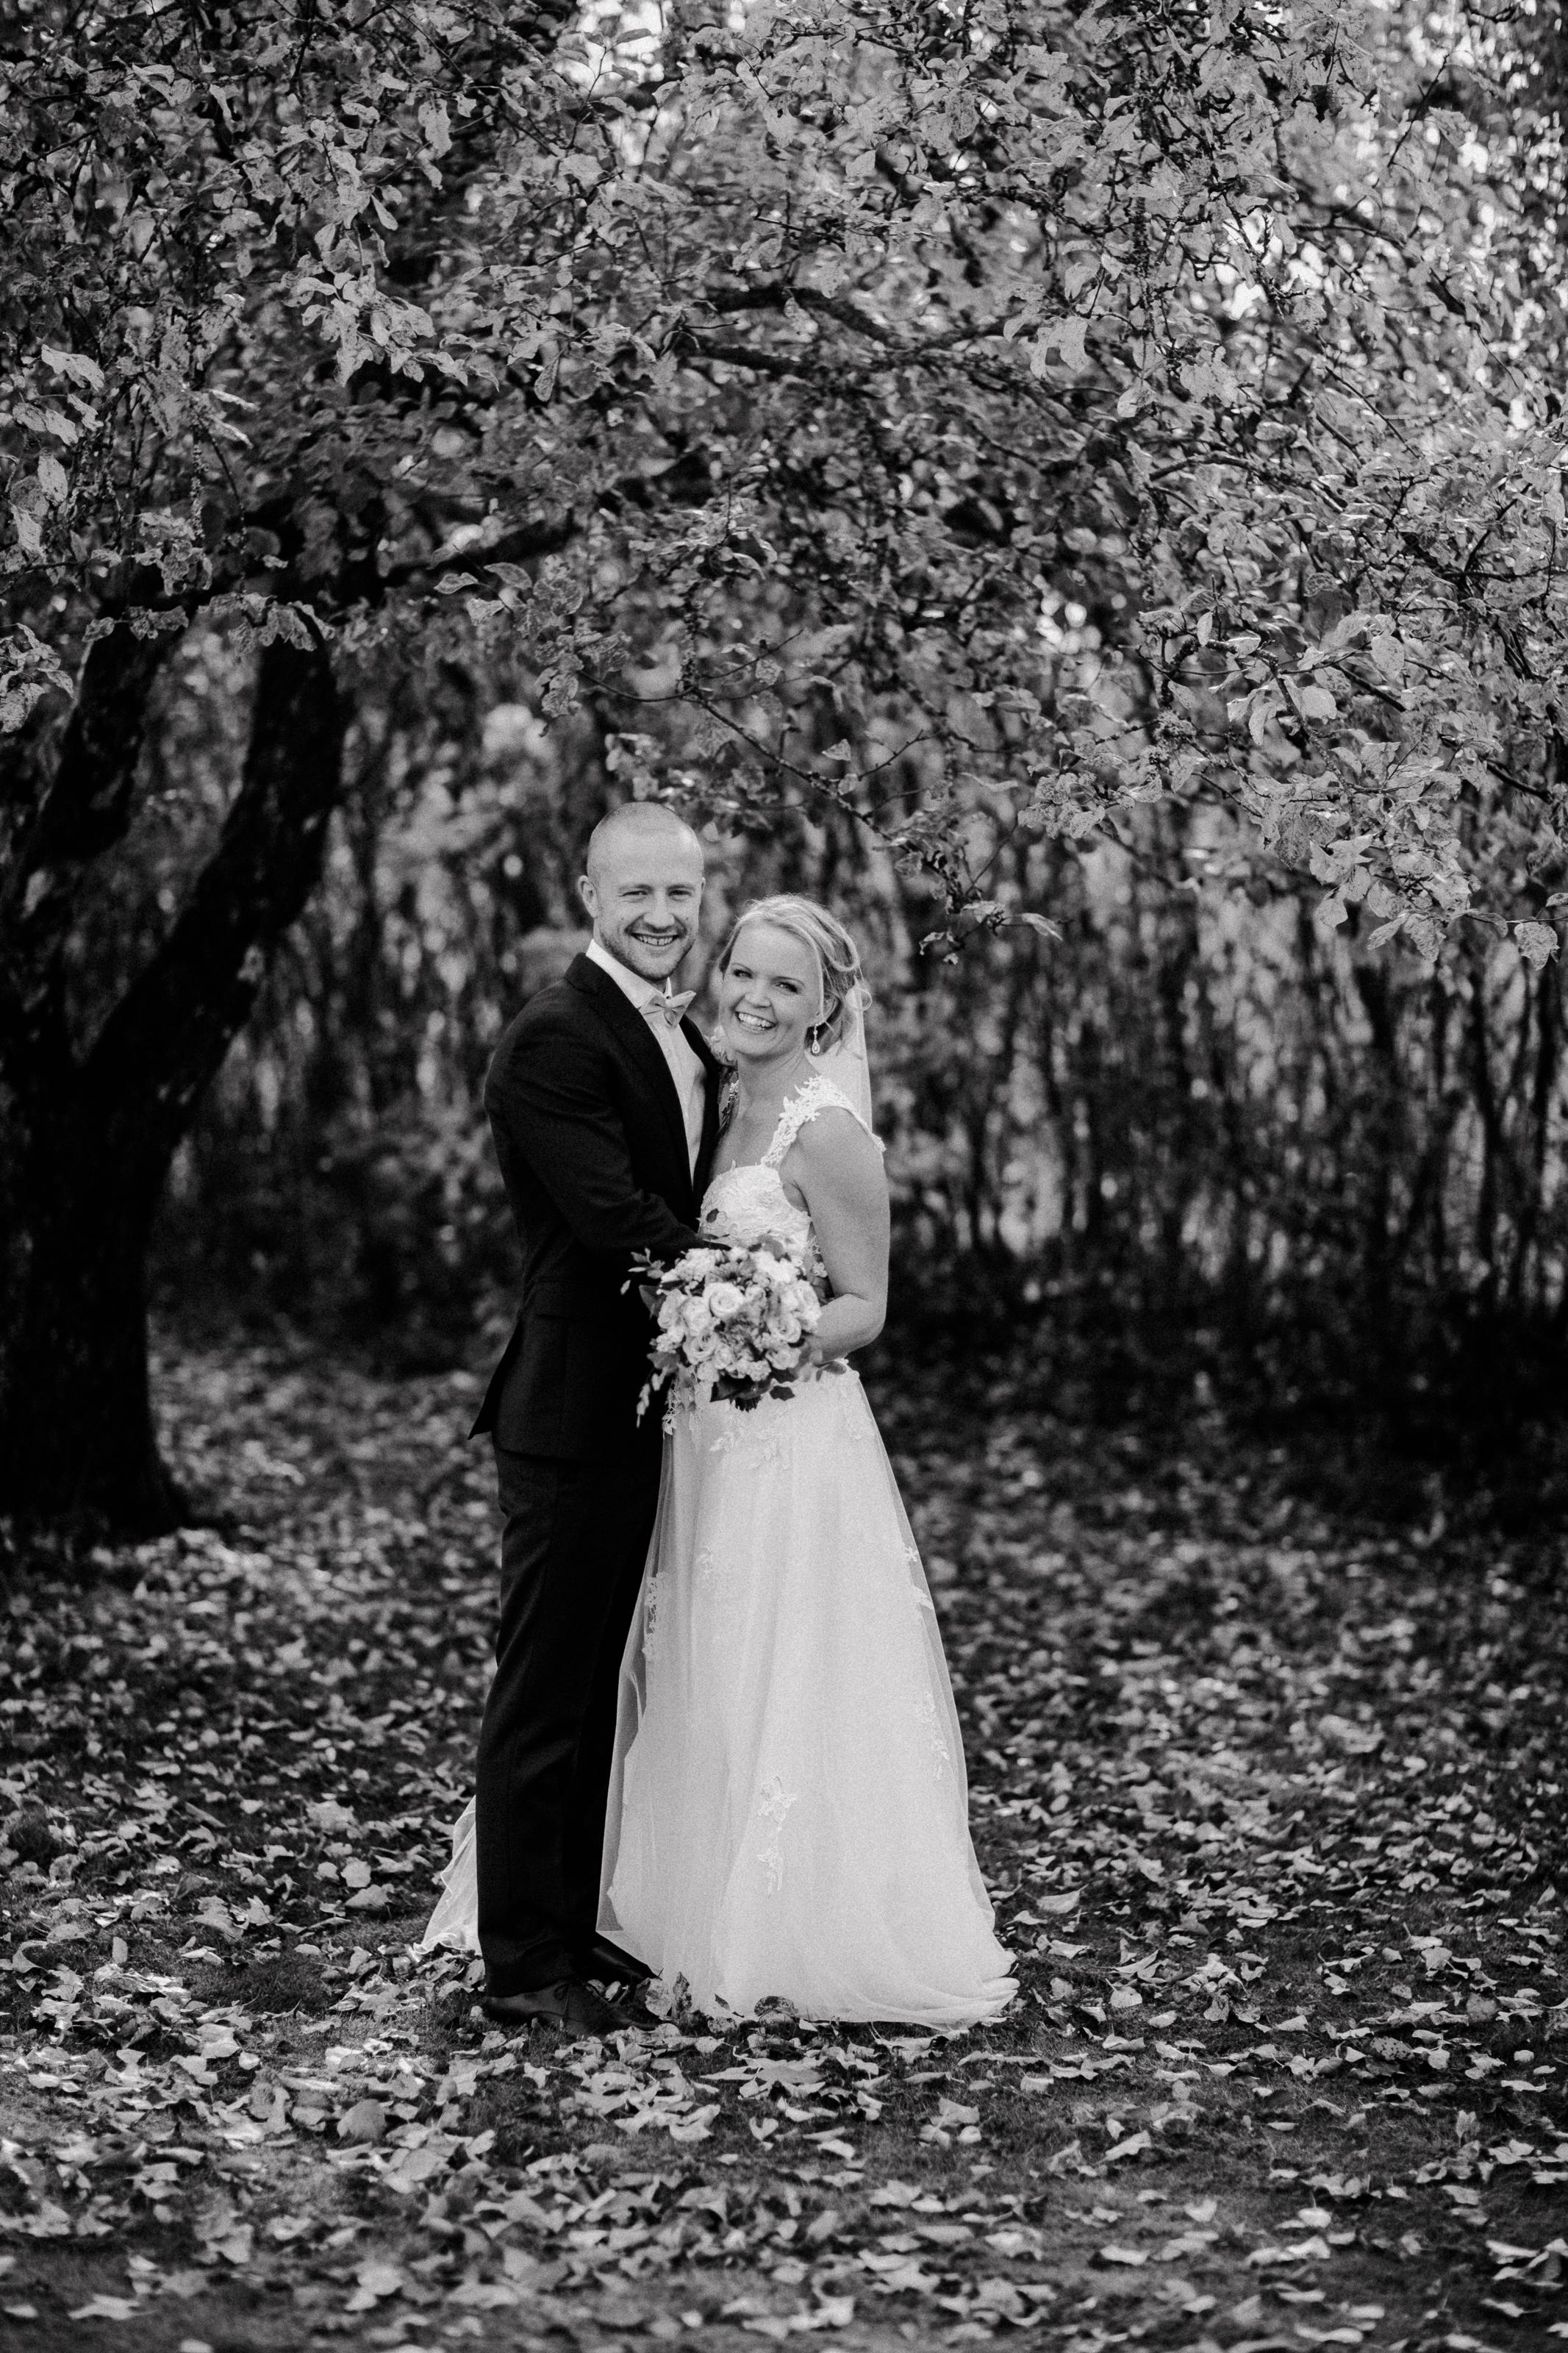 Bröllopsfotograf-Uddetorp Säteri-Höstbröllop-Fotograf Emilia- Bröllopsfotograf Borås-23.jpg